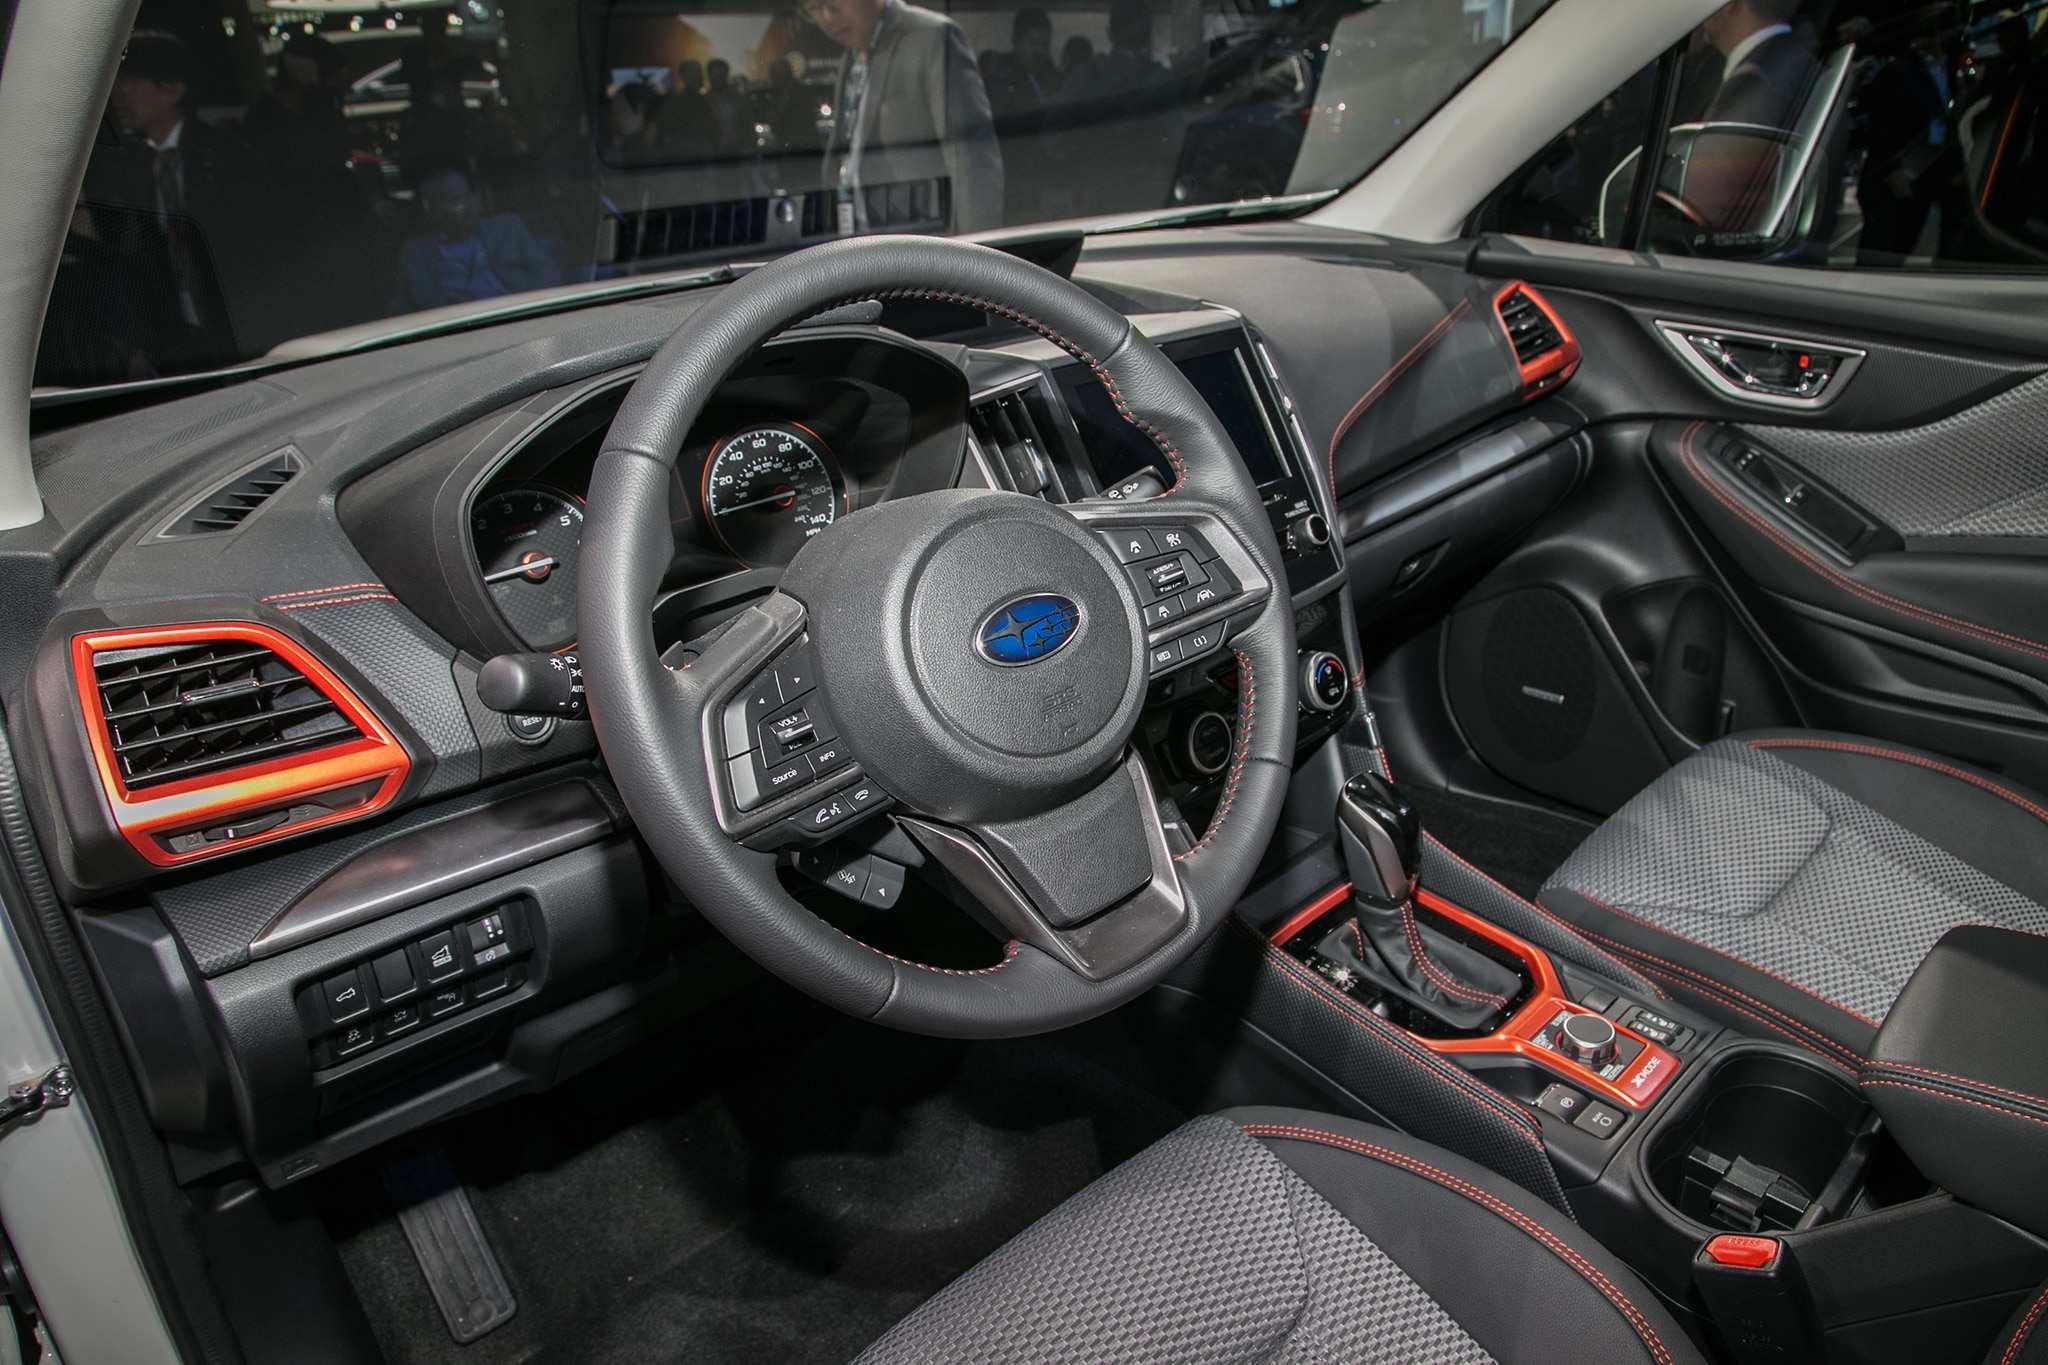 37 New 2019 Subaru Forester Manual Interior for 2019 Subaru Forester Manual